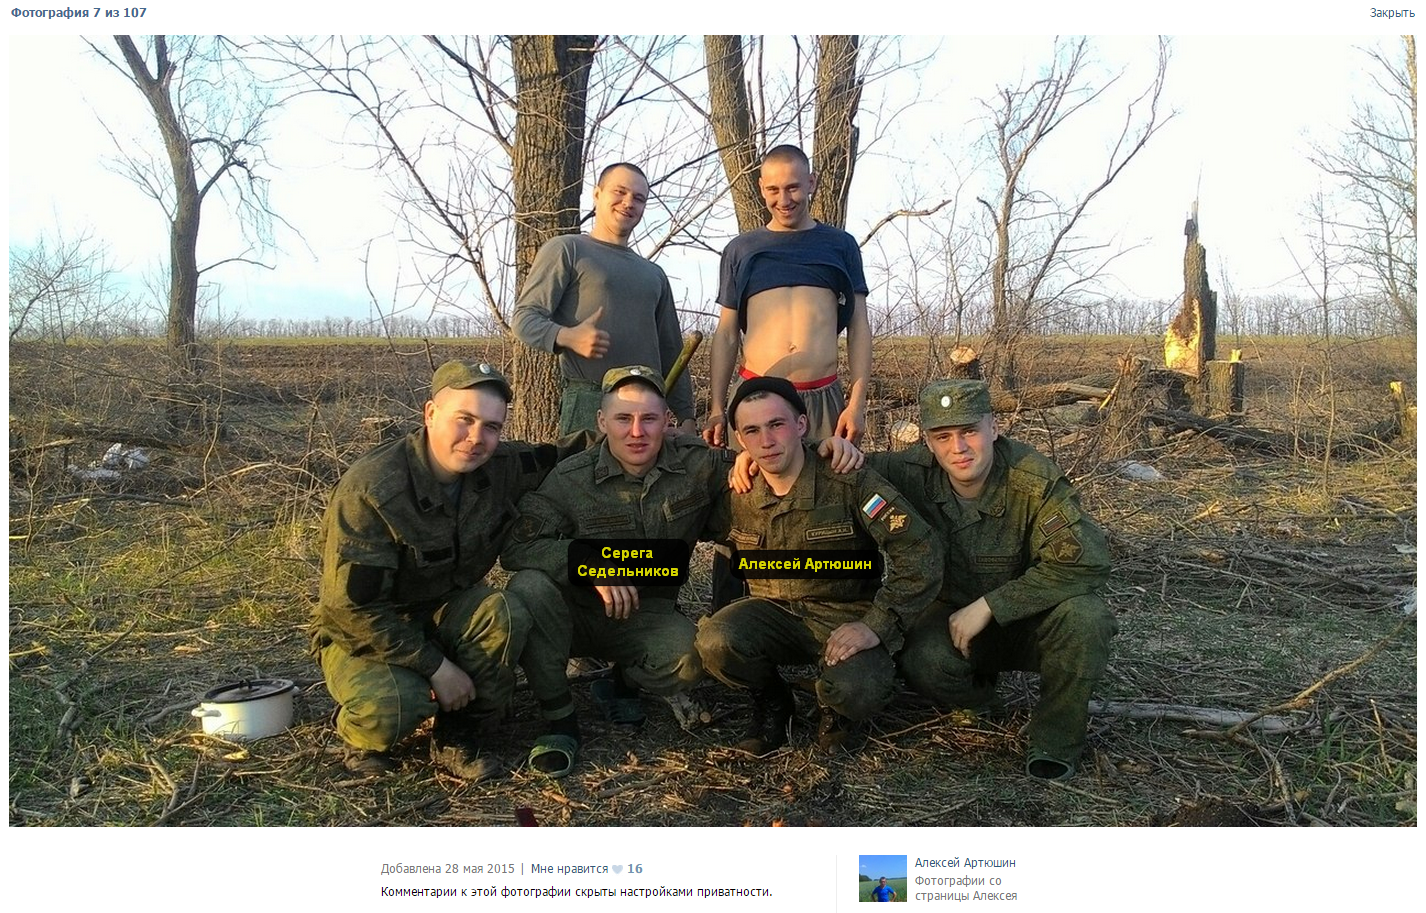 Artyushyn-obshheefoto